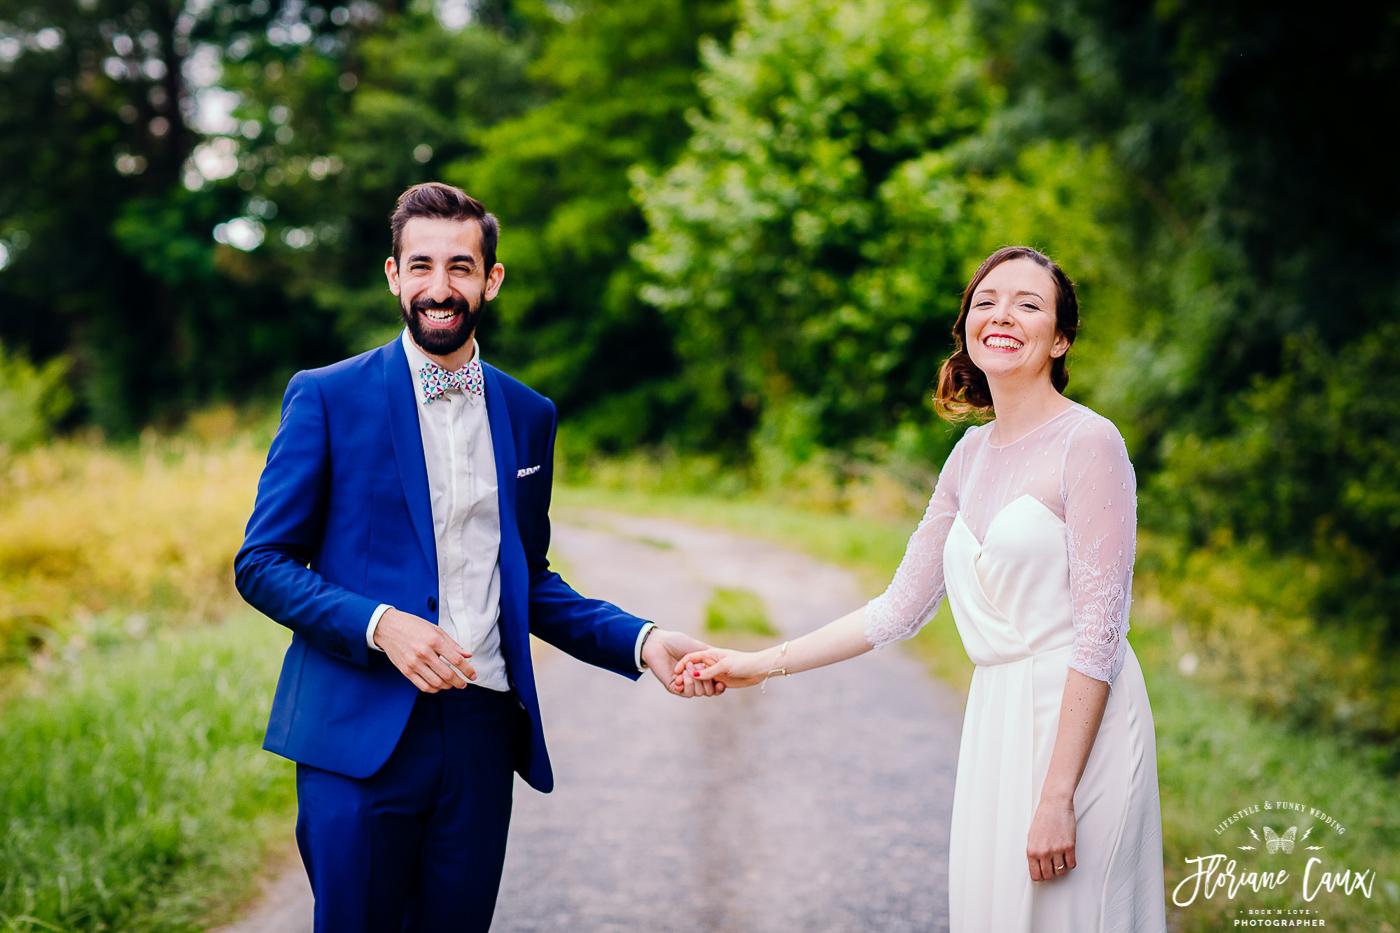 photographe-mariage-pays-basque-Floriane-Caux (39)